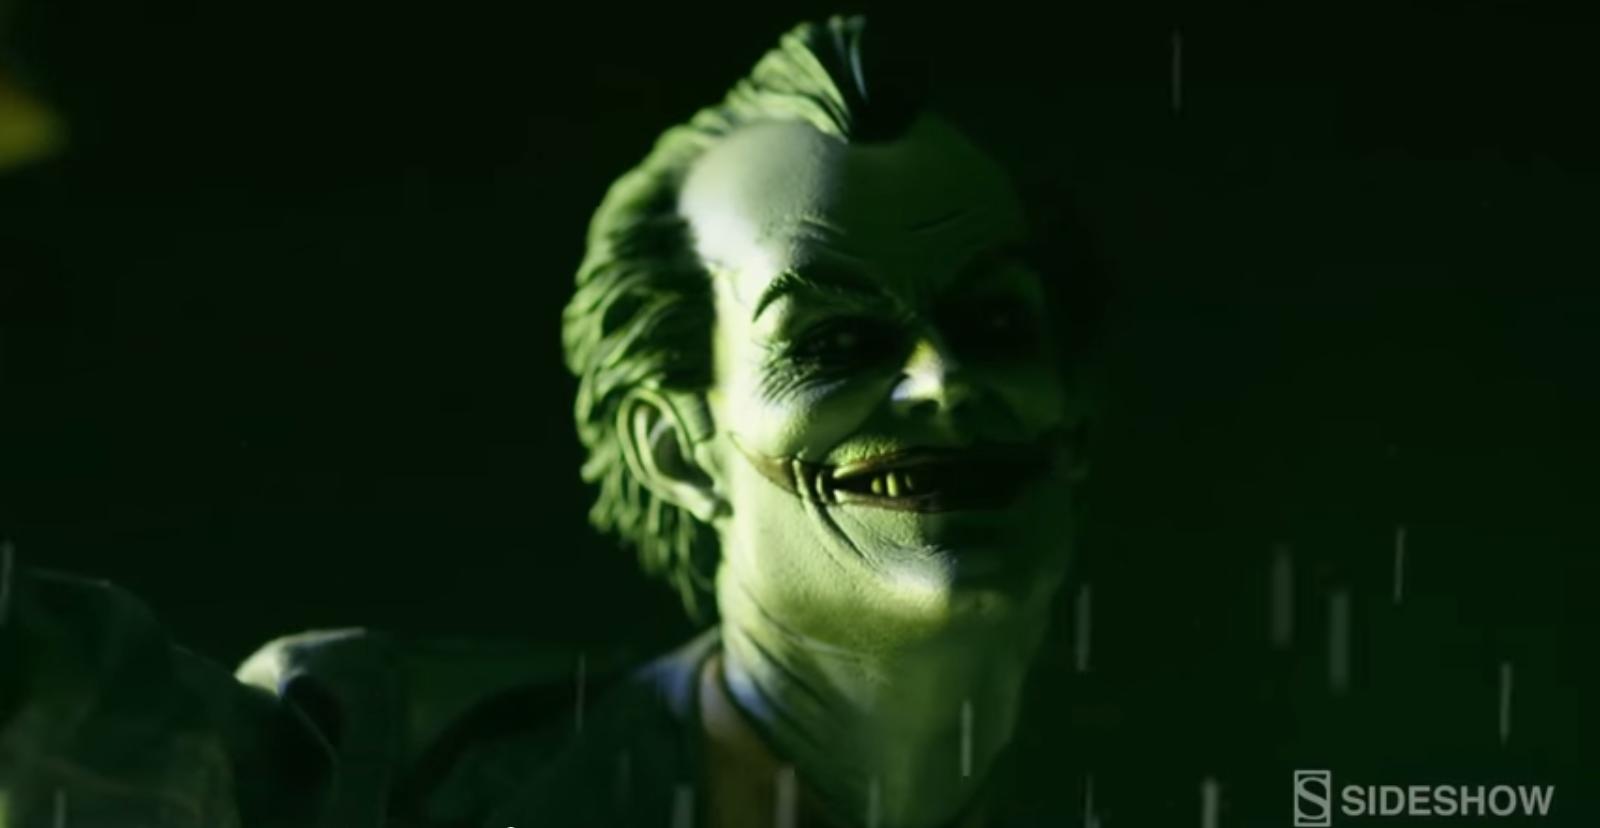 Video per il Joker Arkham Asylum della Sideshow